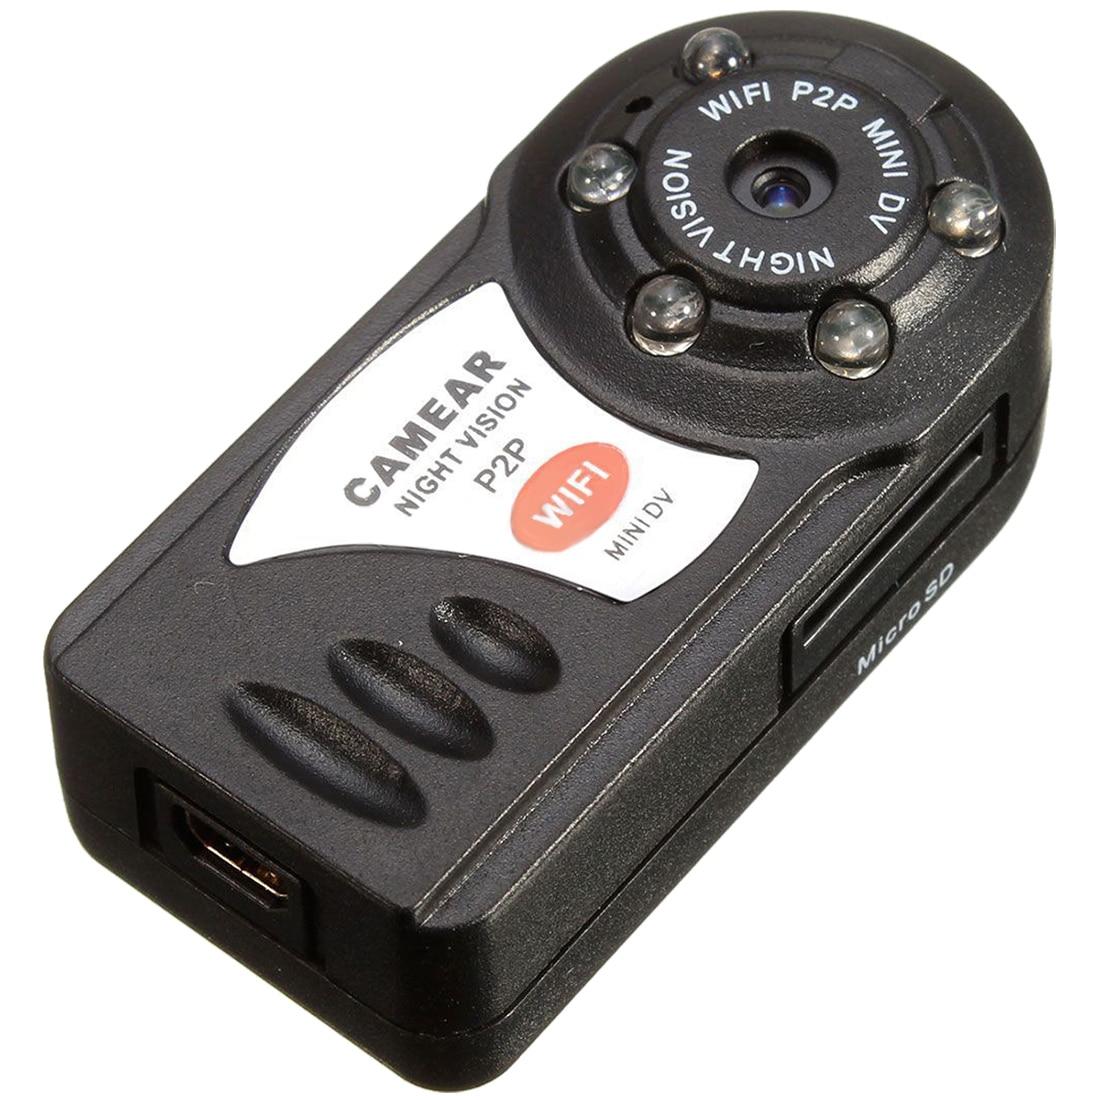 MOOL Mini Wireless WIFI/IP Remote Surveillance DV Security Cam Micro Camera For IOS